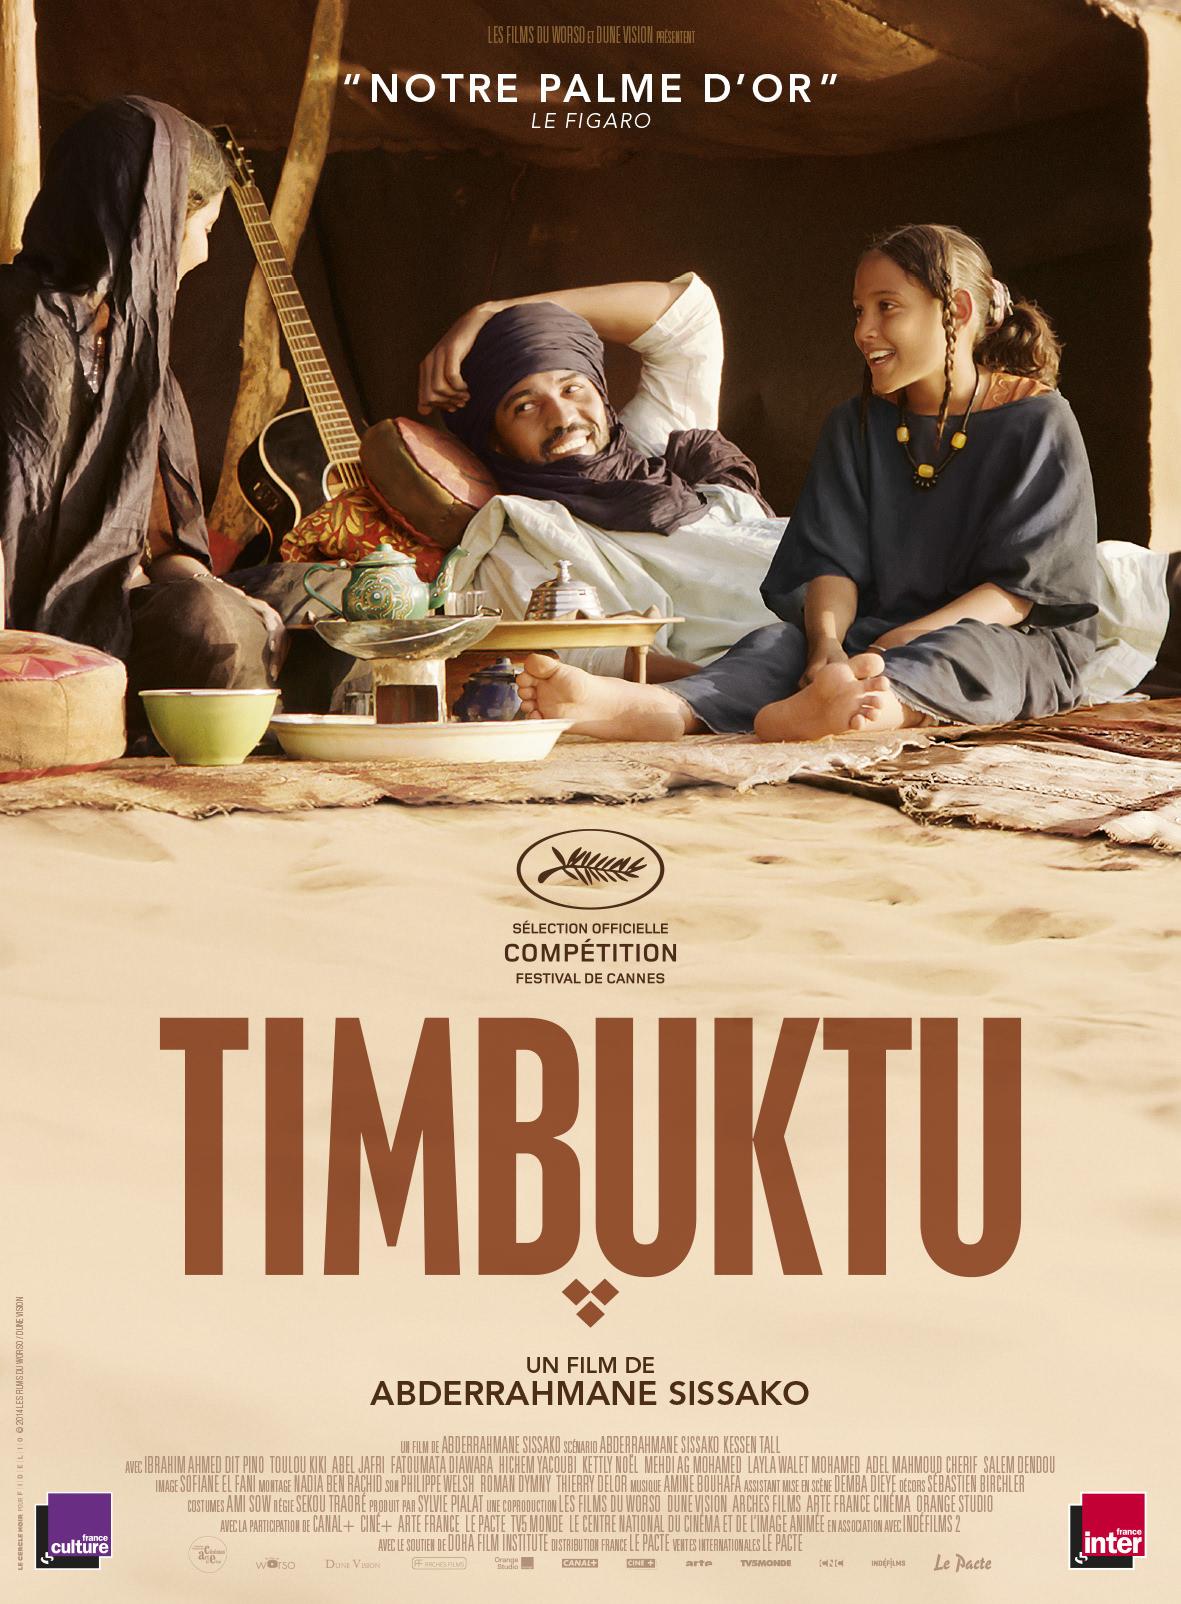 Timbuktu sissako